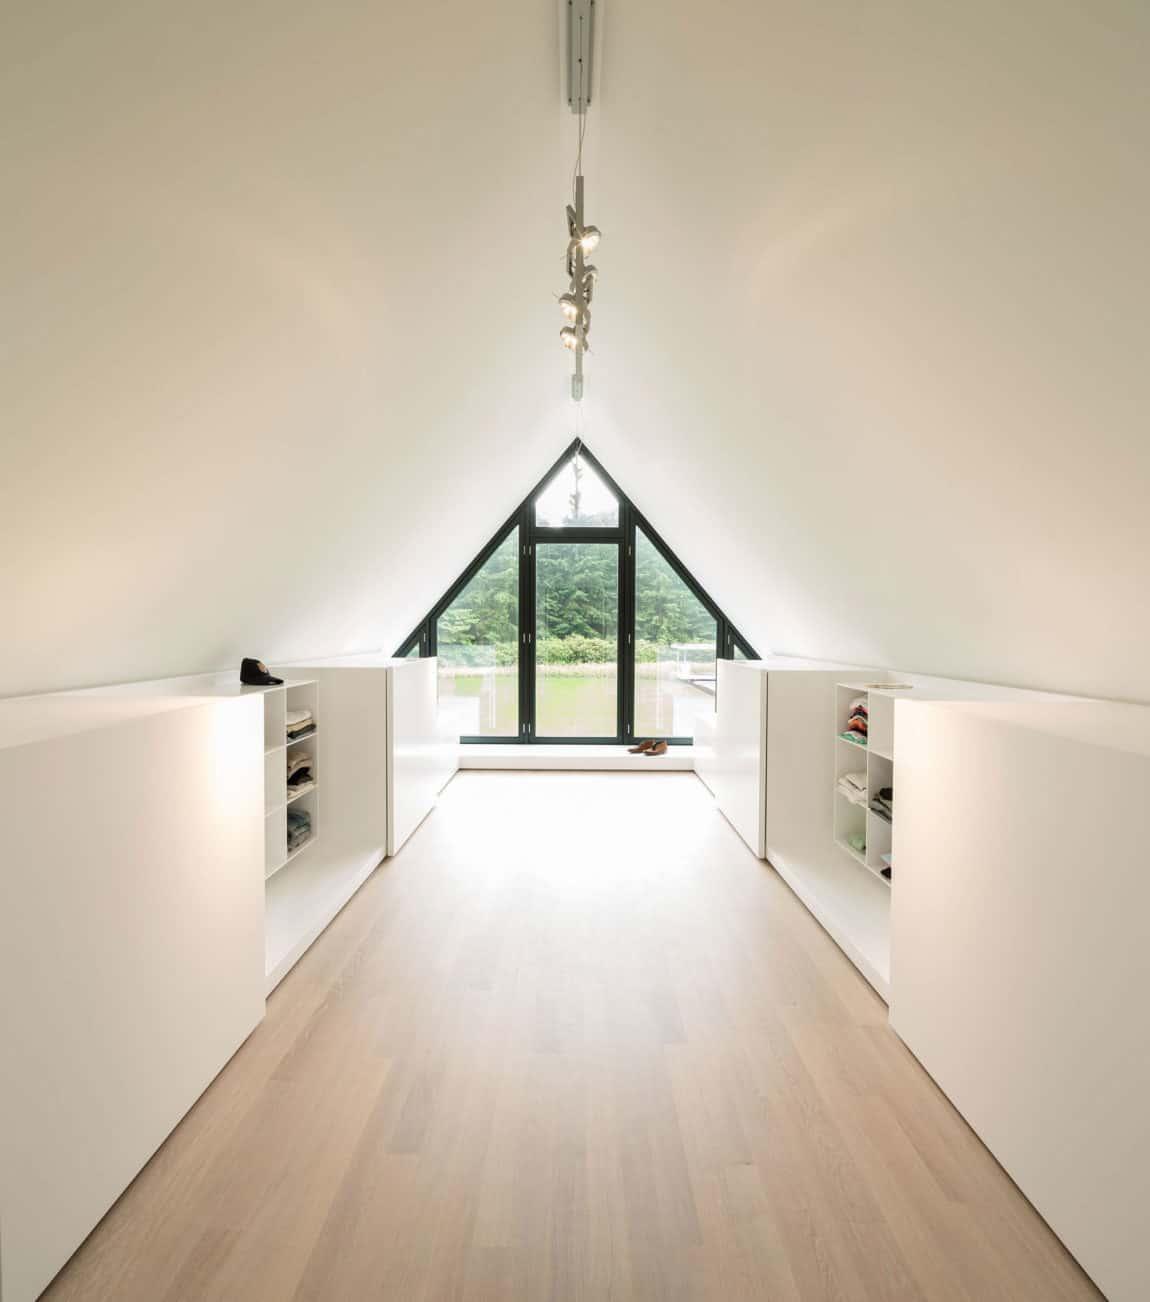 Villa Huizen by De Brouwer Binnenwerk (22)